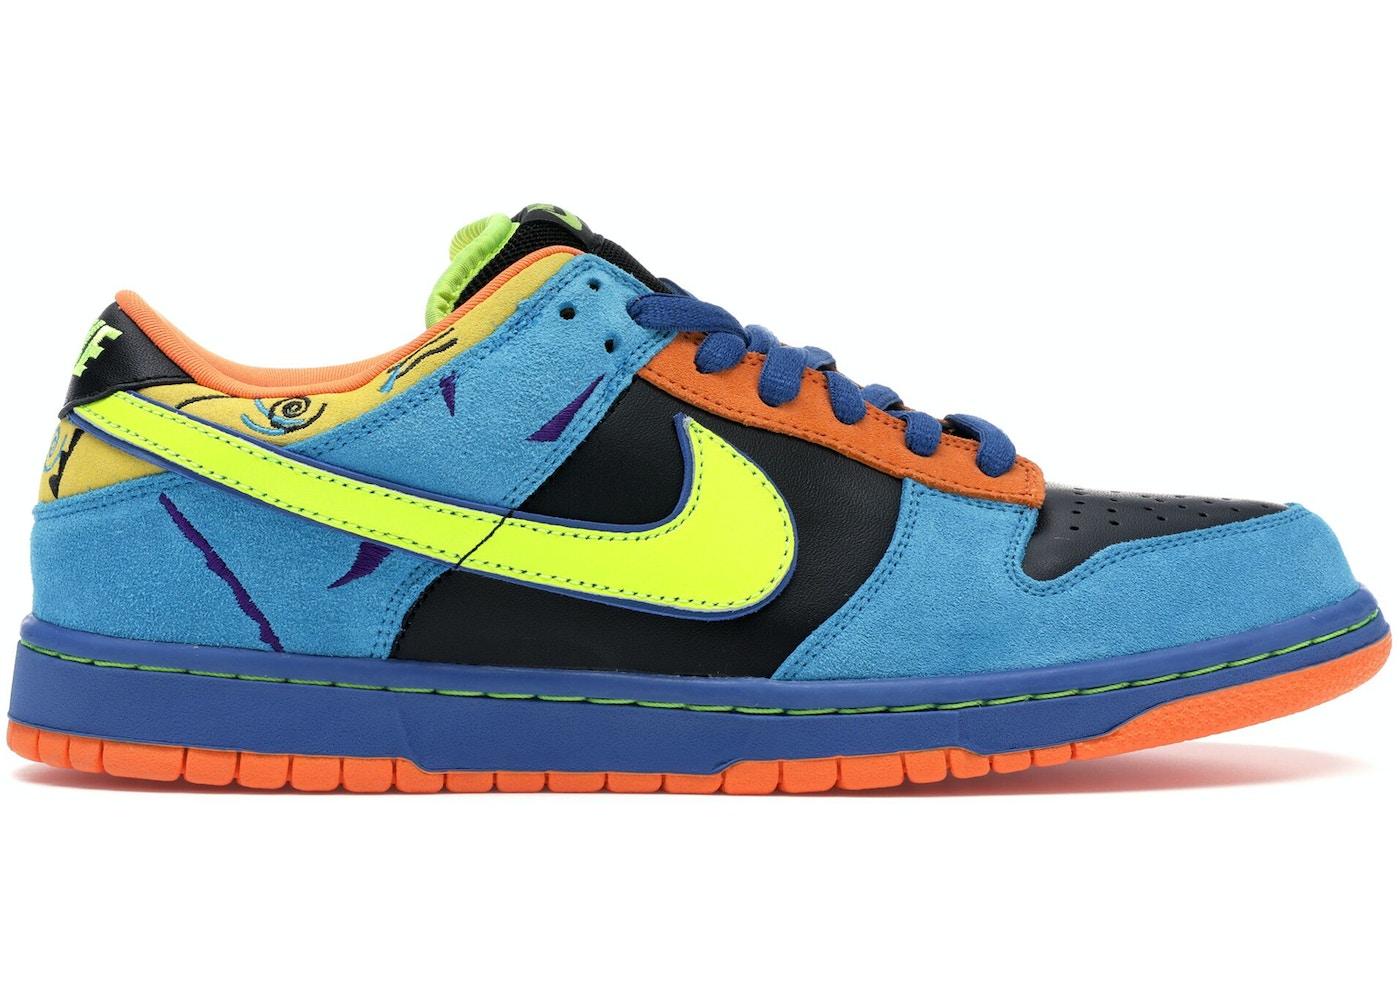 super popular f1a40 c56a4 Nike Dunk SB Low Skate or Die